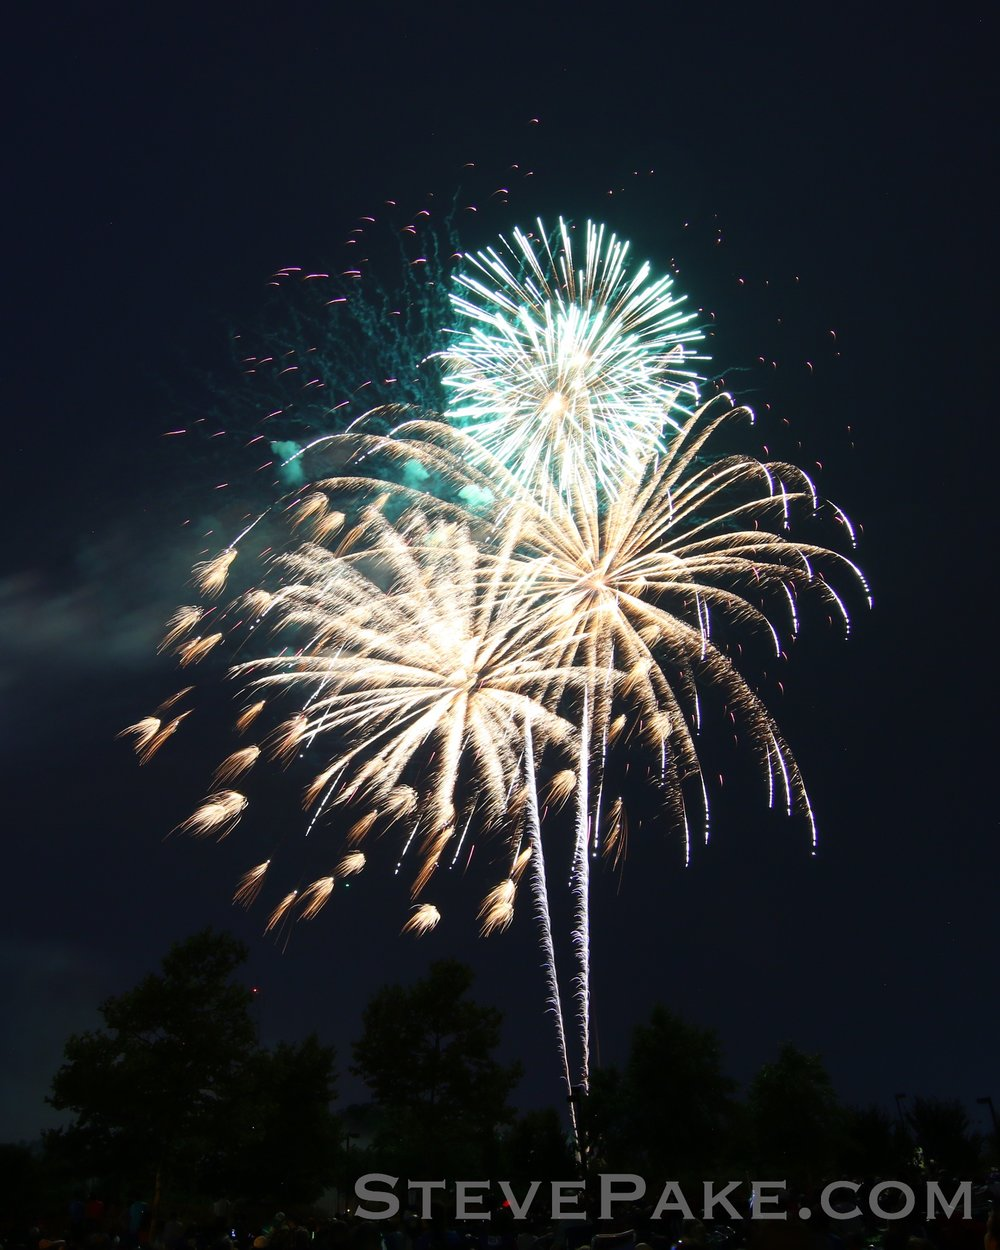 Fireworks2018_57_GE3A8608ap-HD-WM.jpg